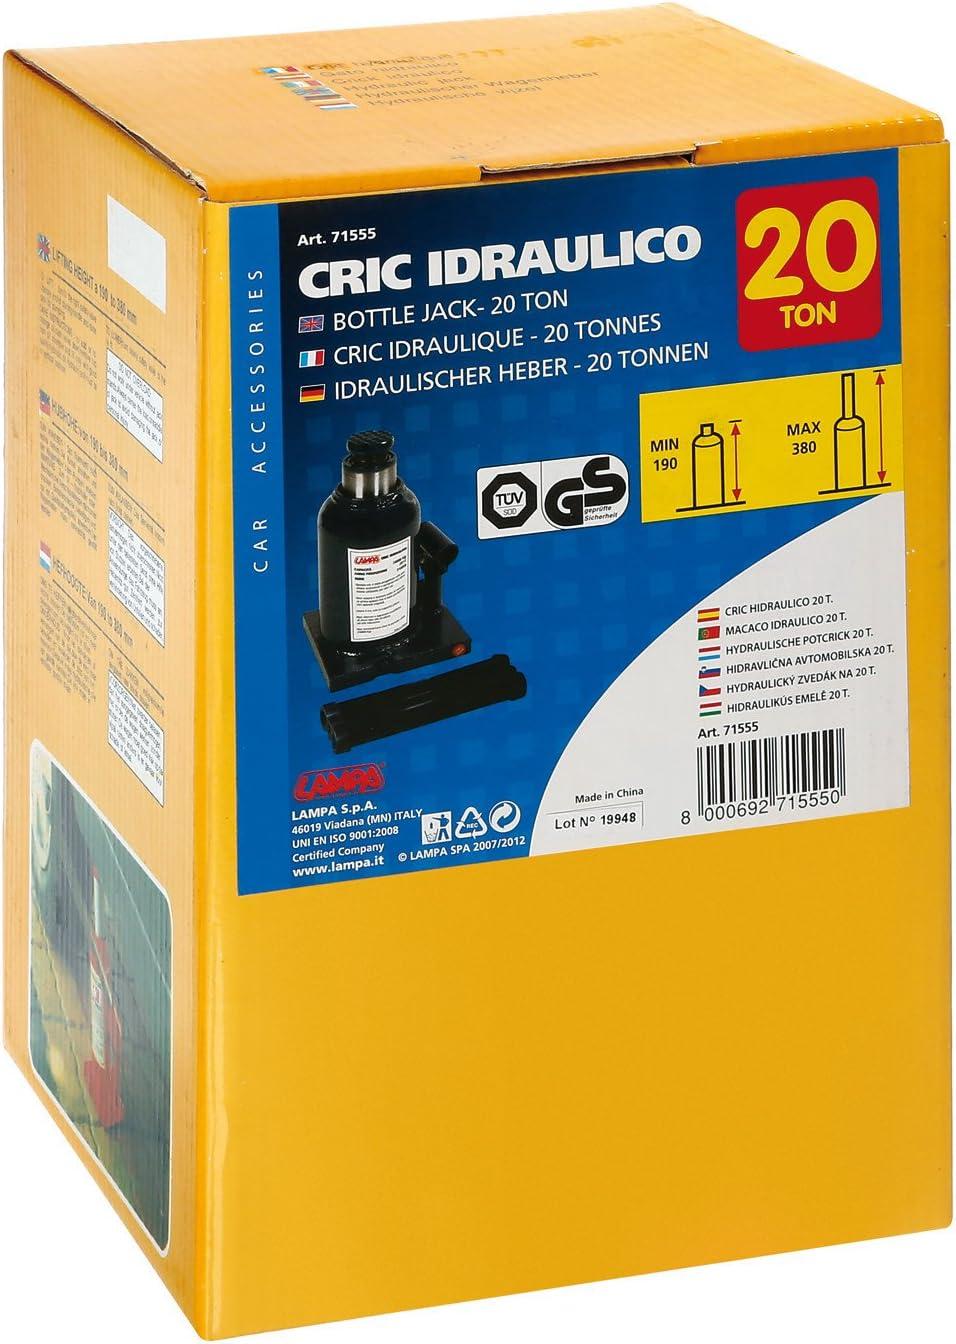 Lampa 71555 Cric Hydraulique 20 000 kg